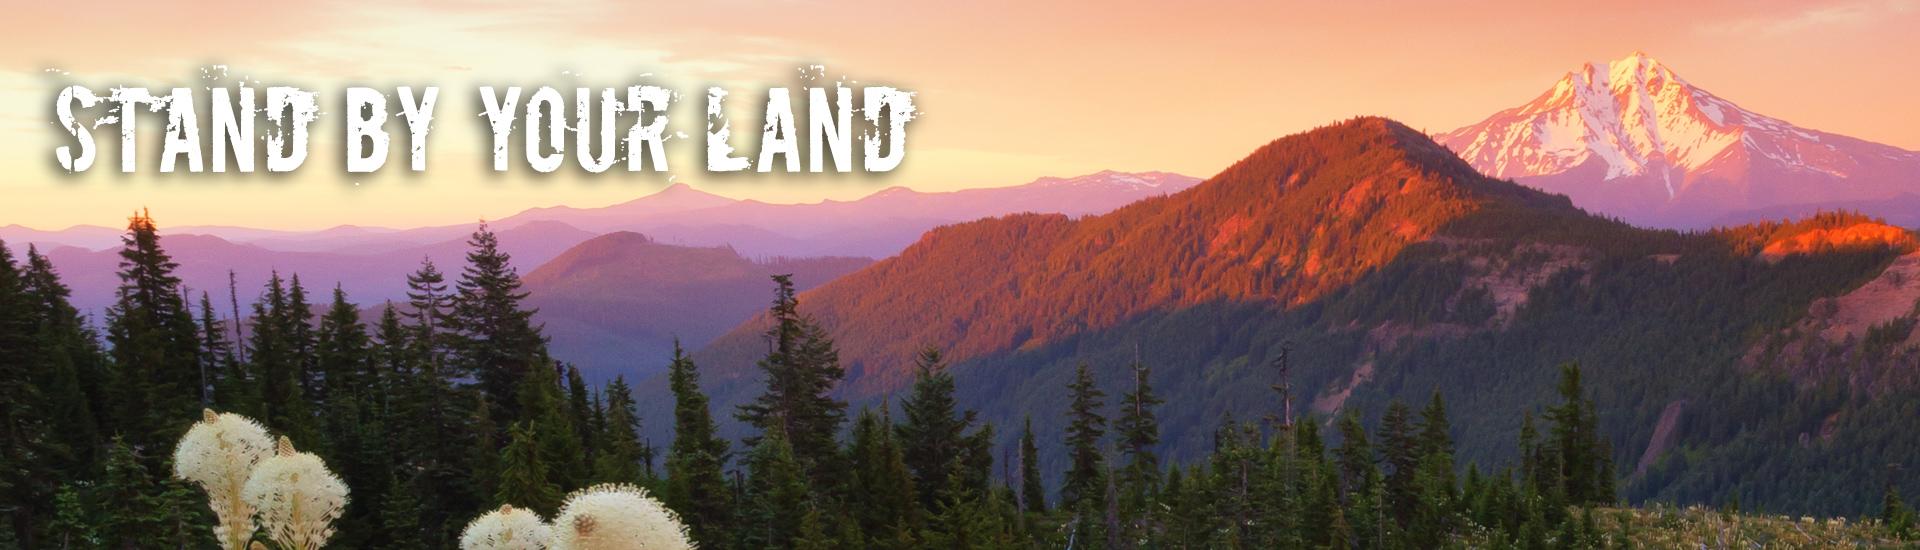 Oregon Wilderness Conference 2015 (photo by Michael Burkhardt)